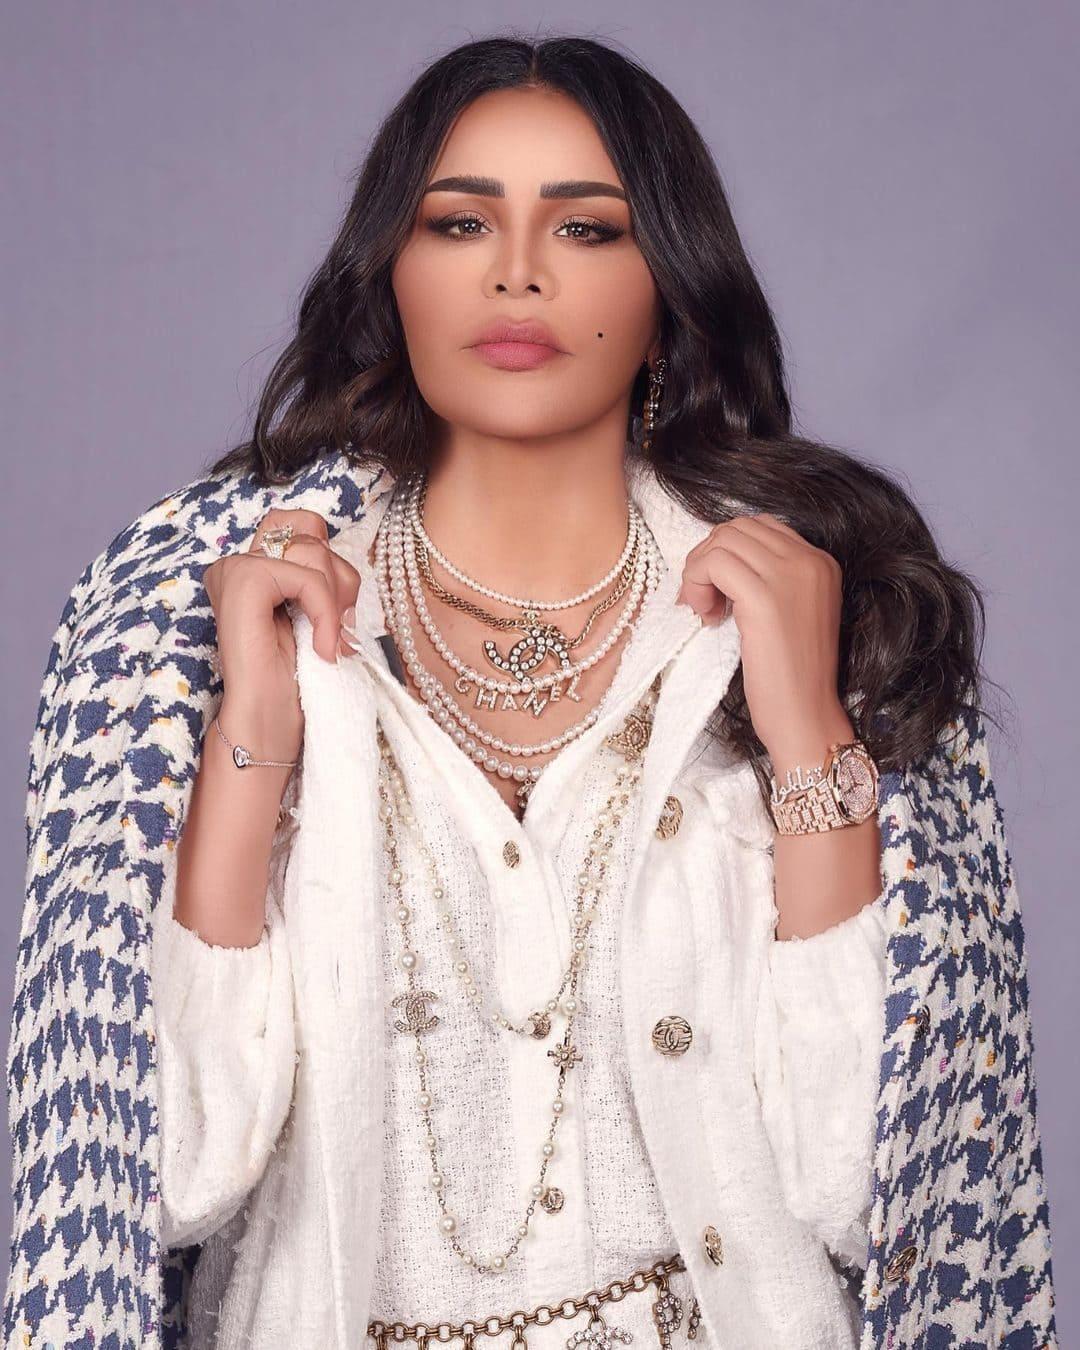 Ahlam Al Shamsi (Singer) Wiki, Age, Husband, Net Worth & More 6